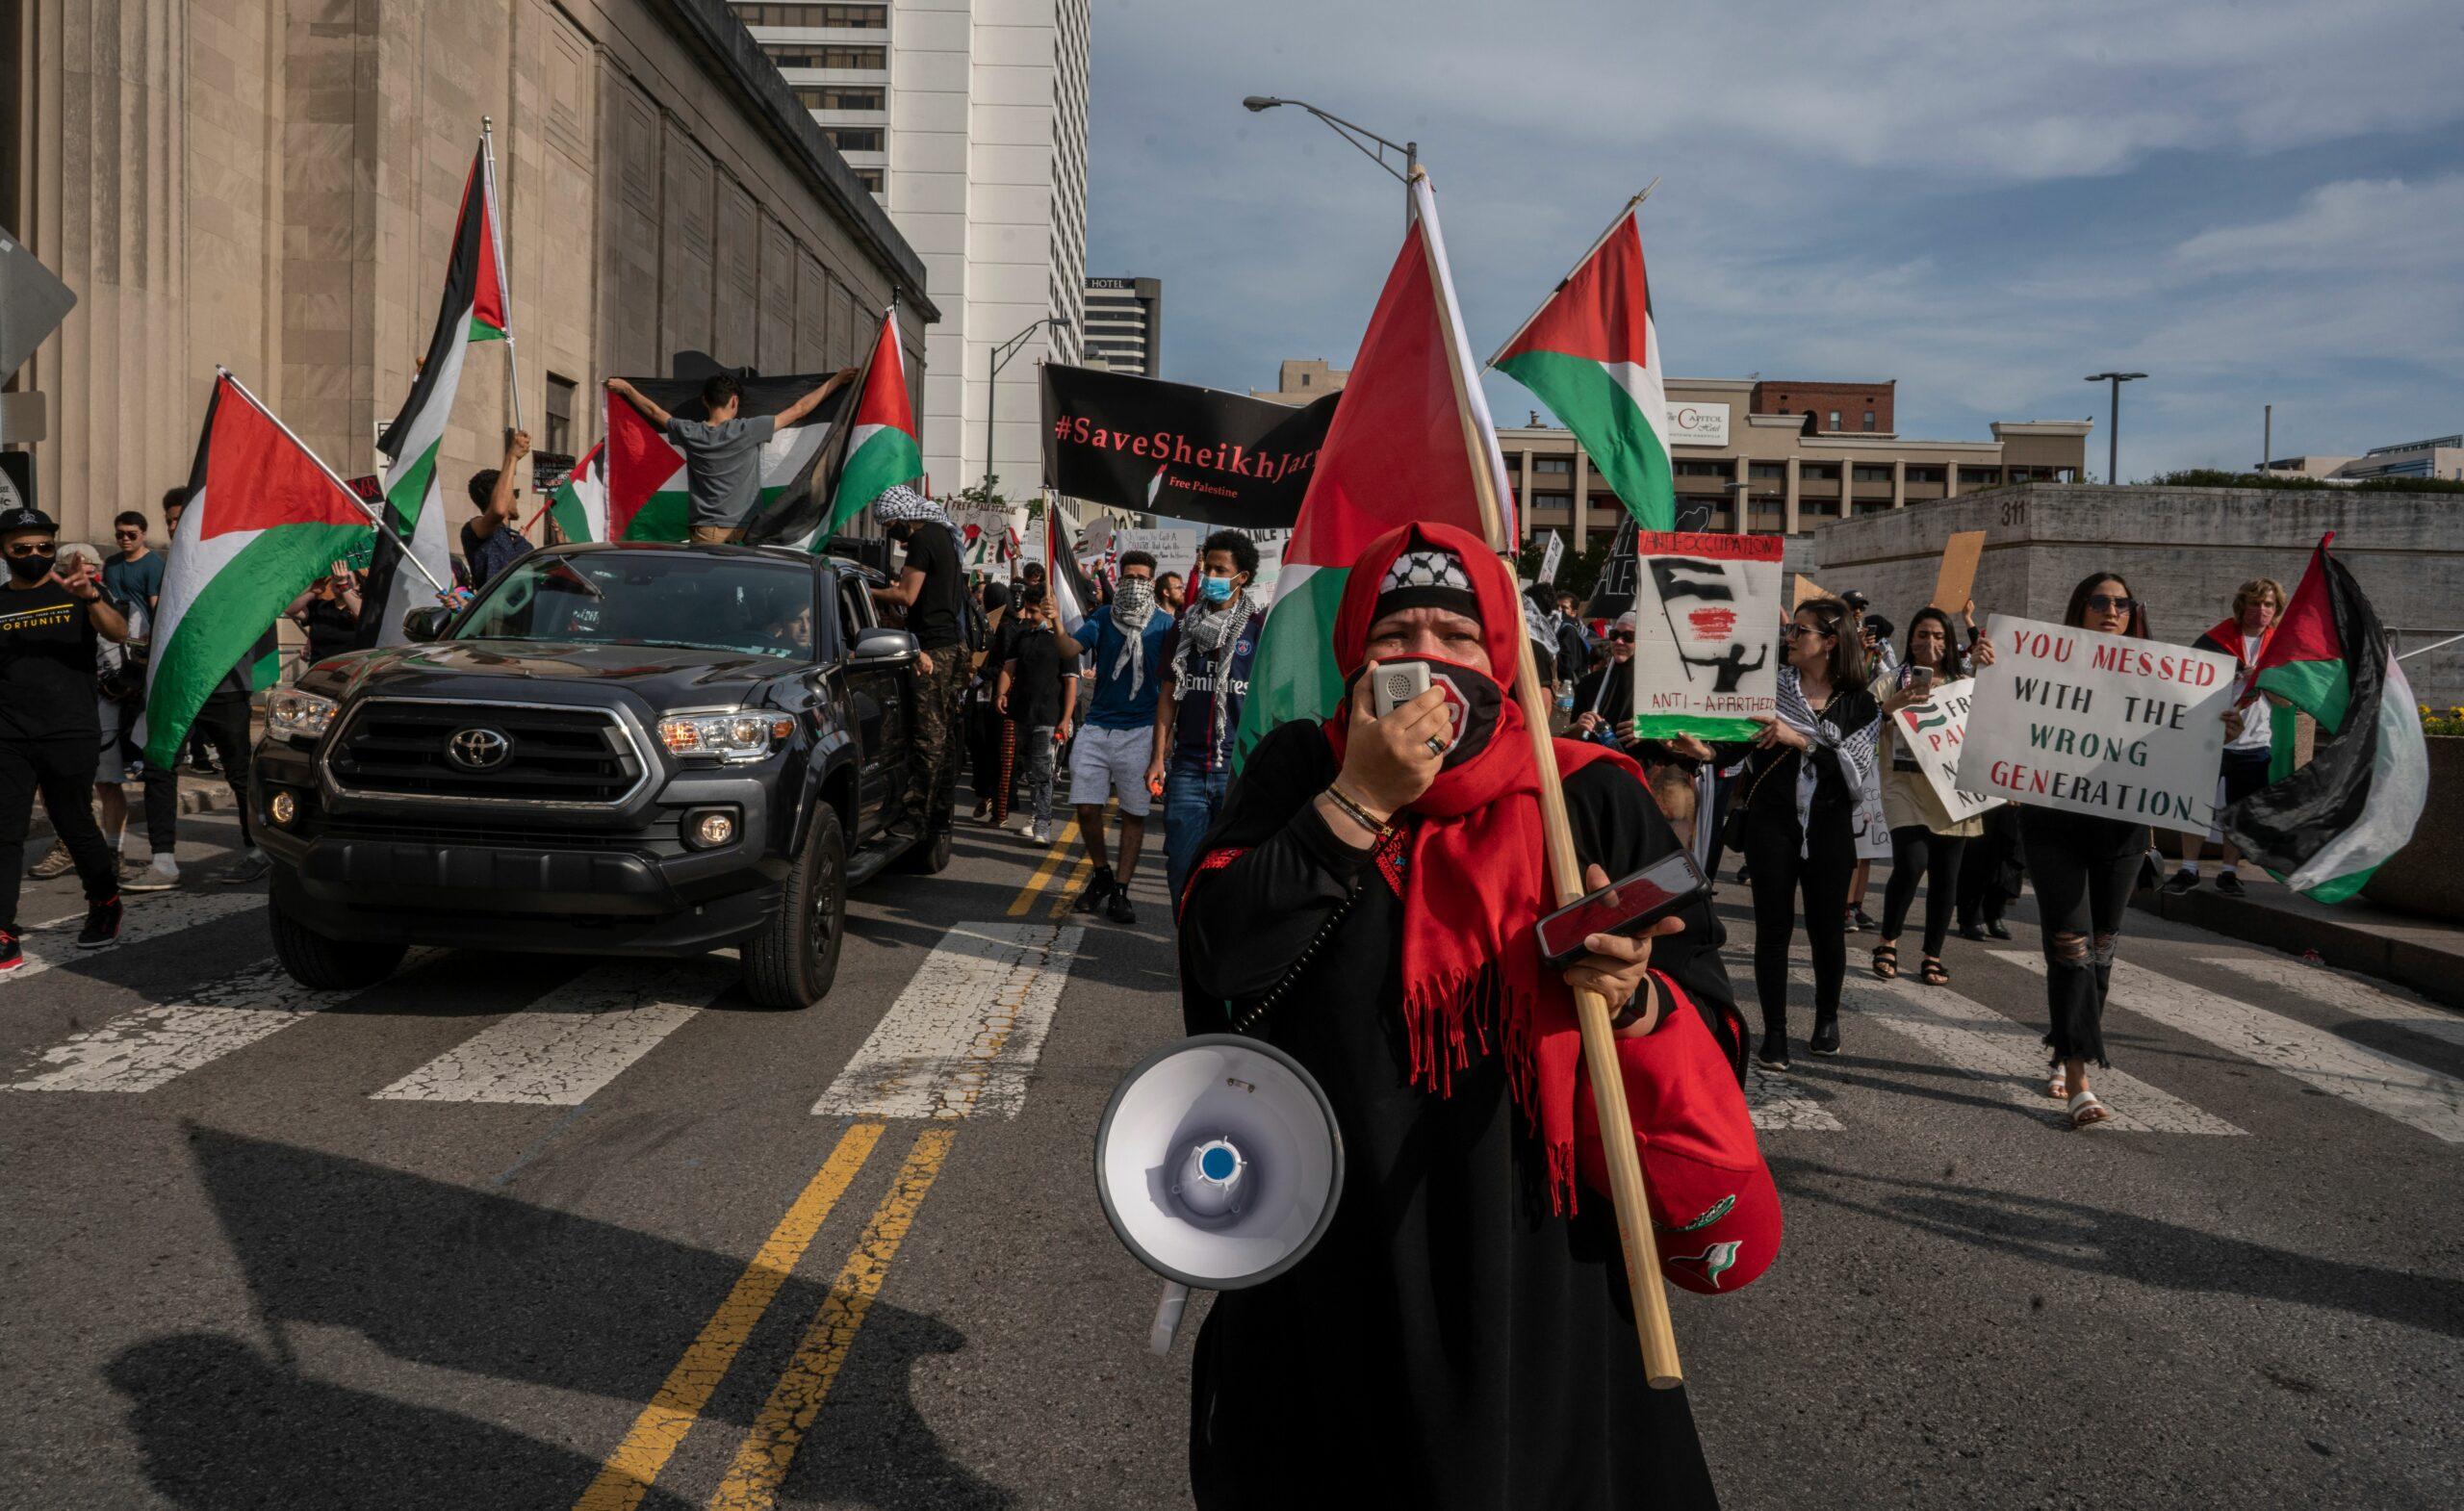 Eman Elmhaida leads the group of demonstrators on Friday. (Photo: John Partipilo)